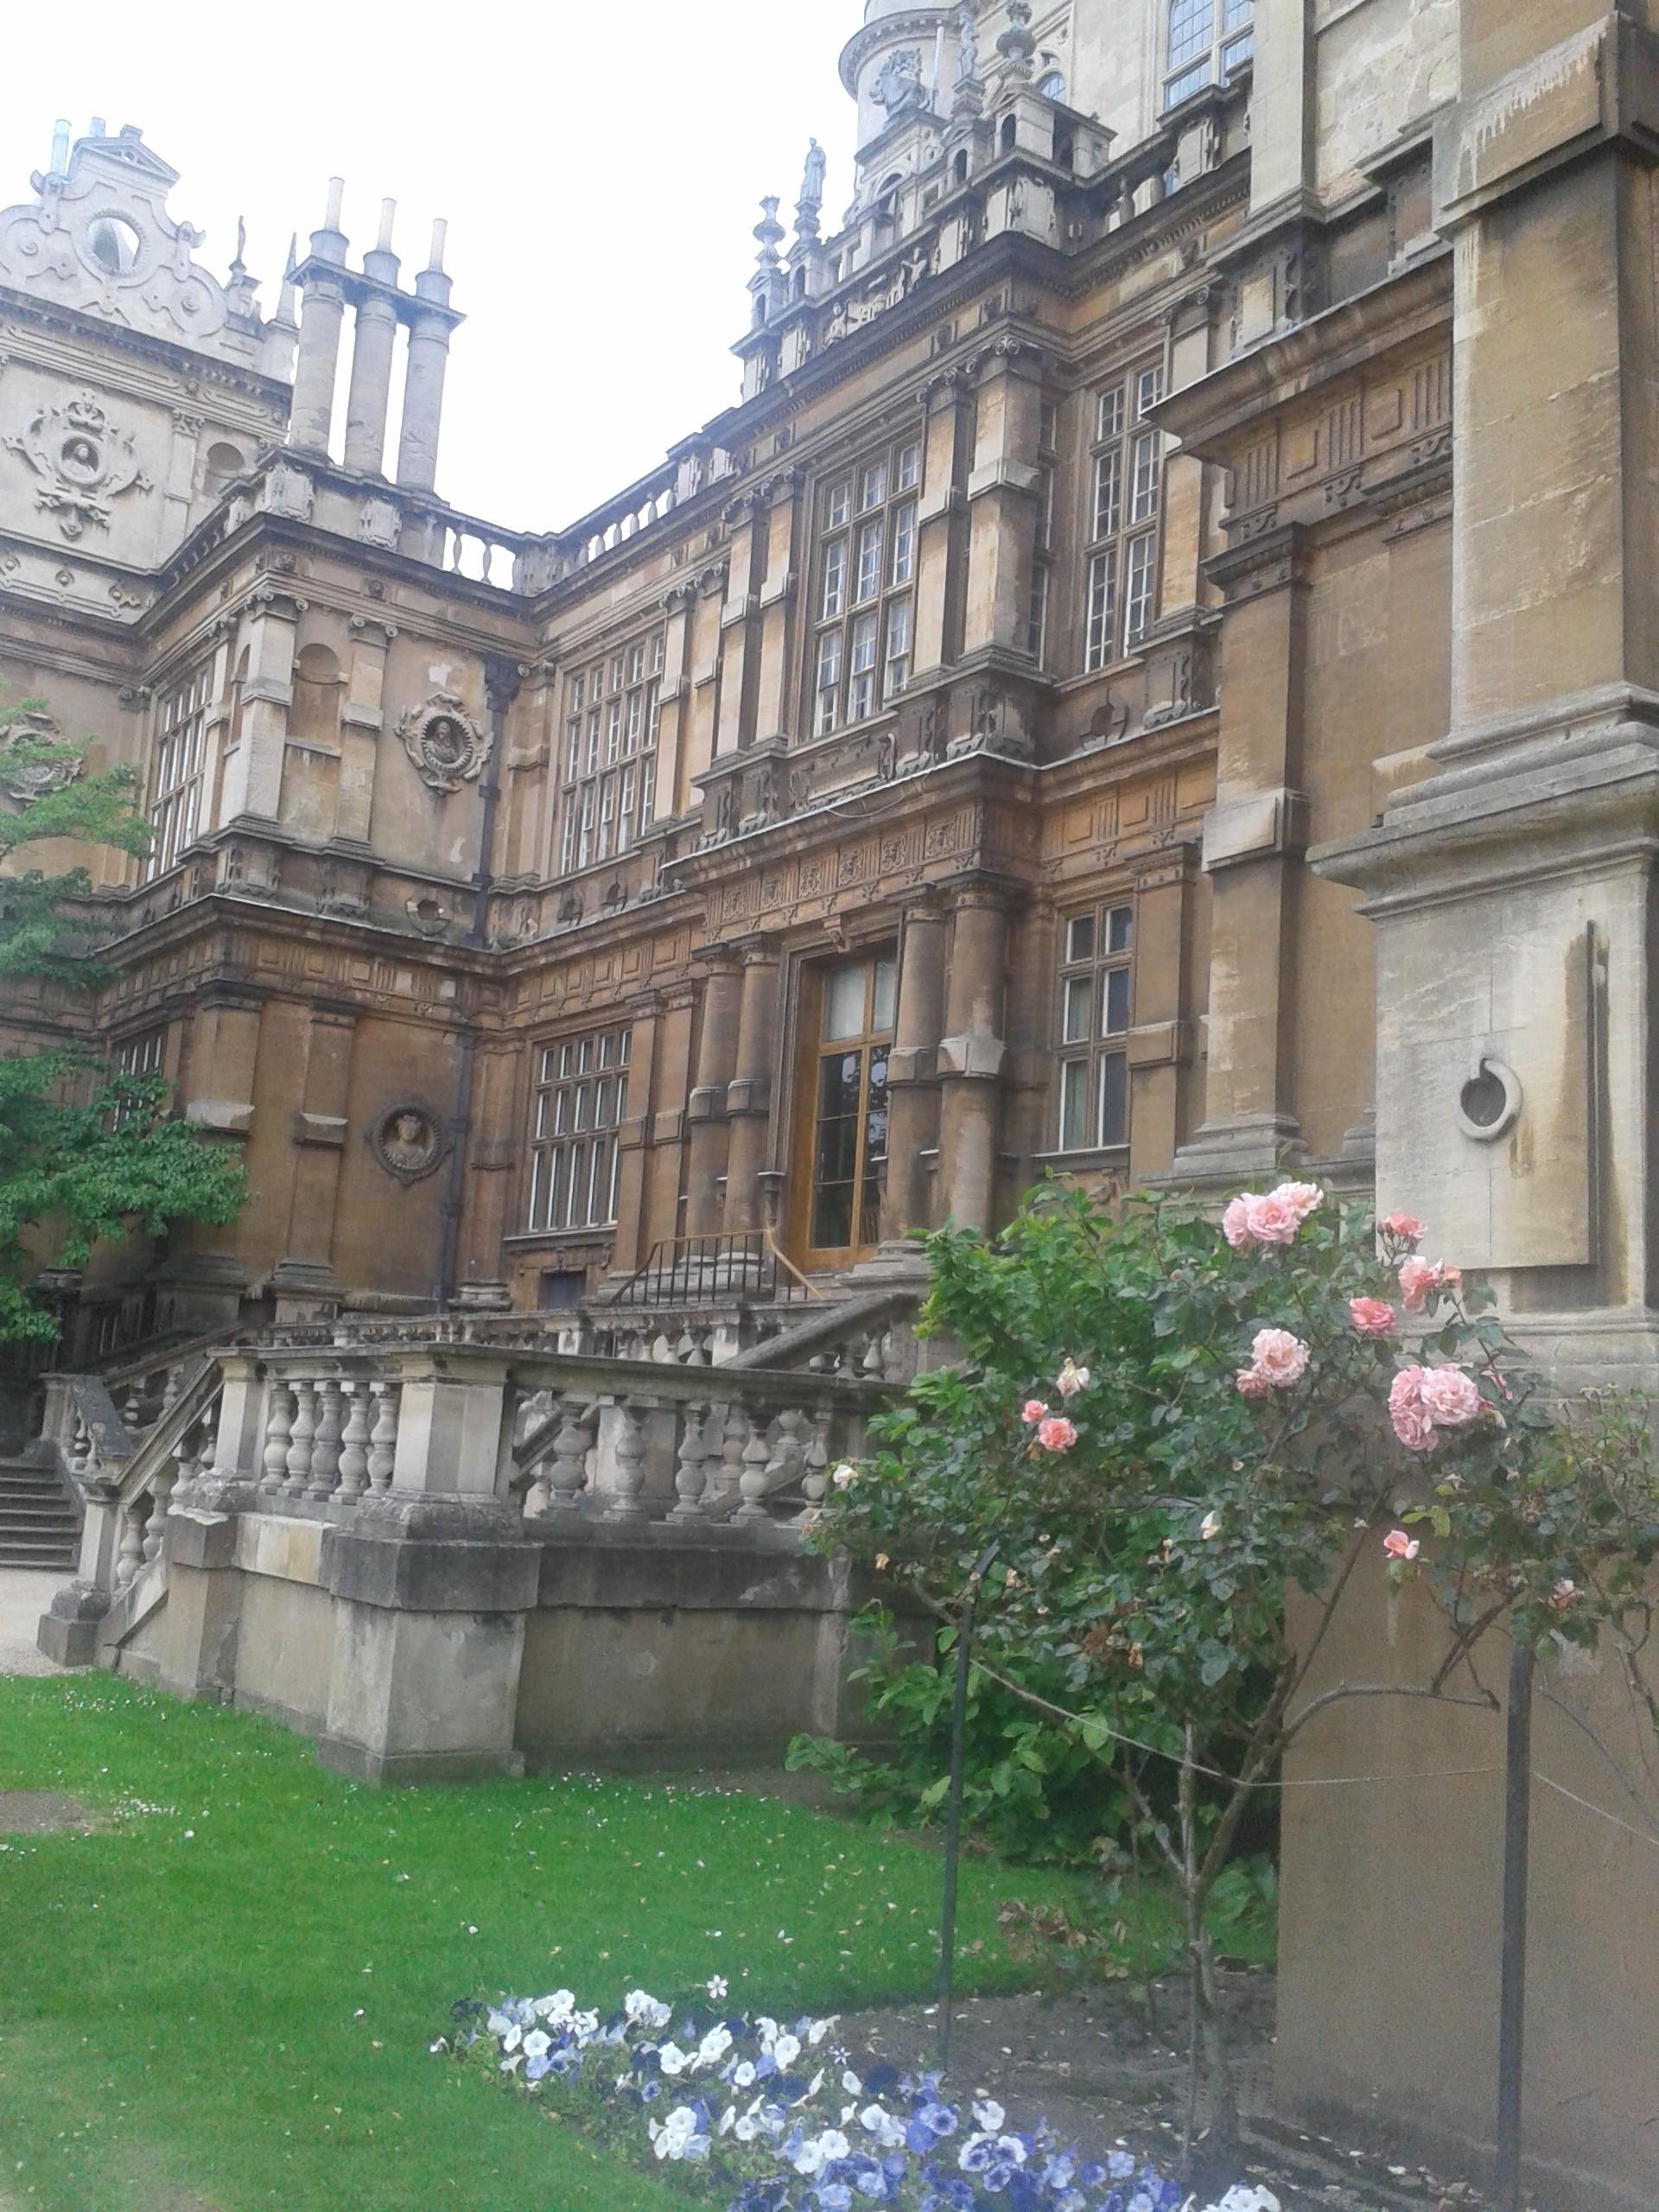 Wollaton Hall, Nottingham | Todd's Travels Travel Blog